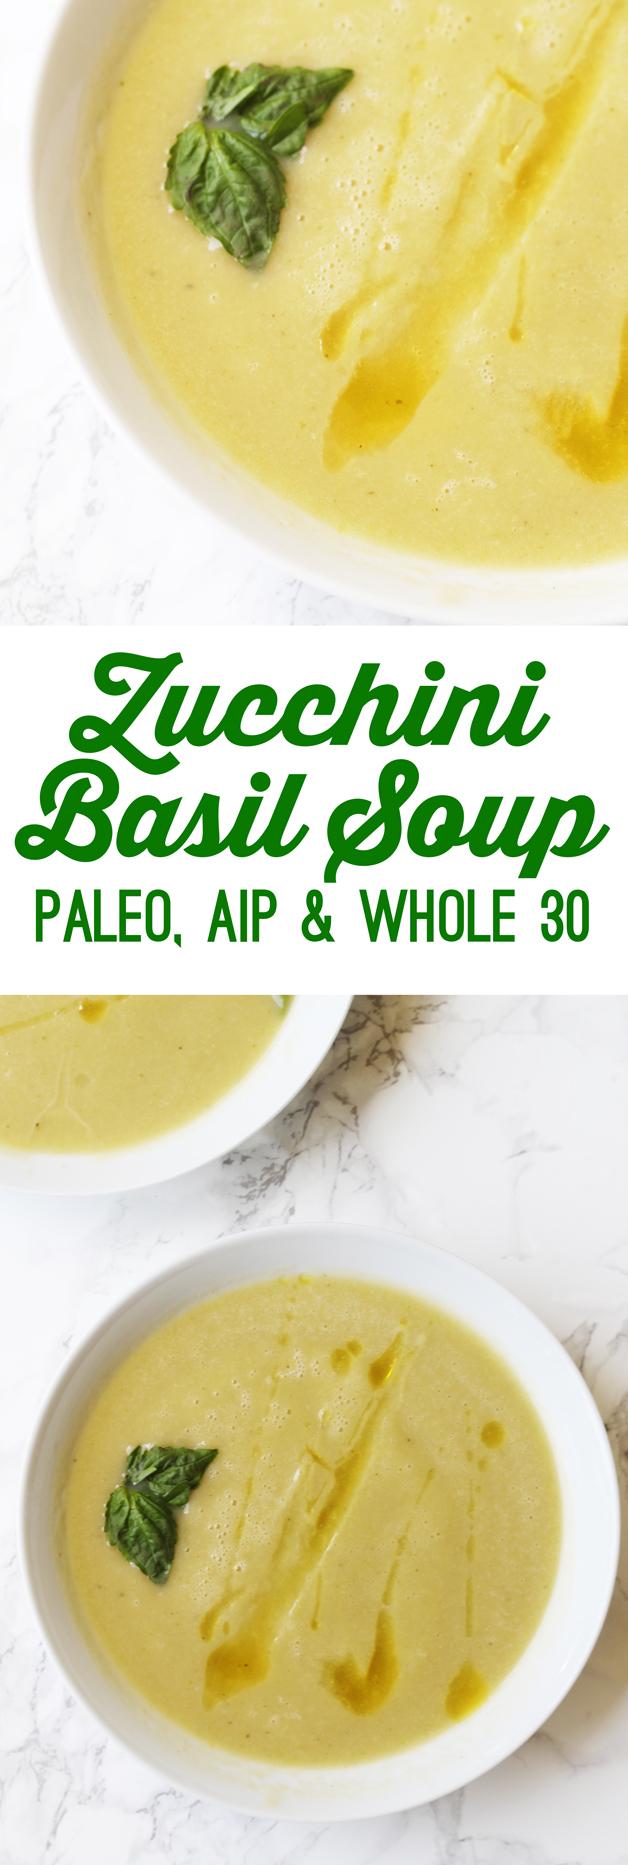 Zucchini Basil Summer Soup (Paleo, AIP, Whole30)